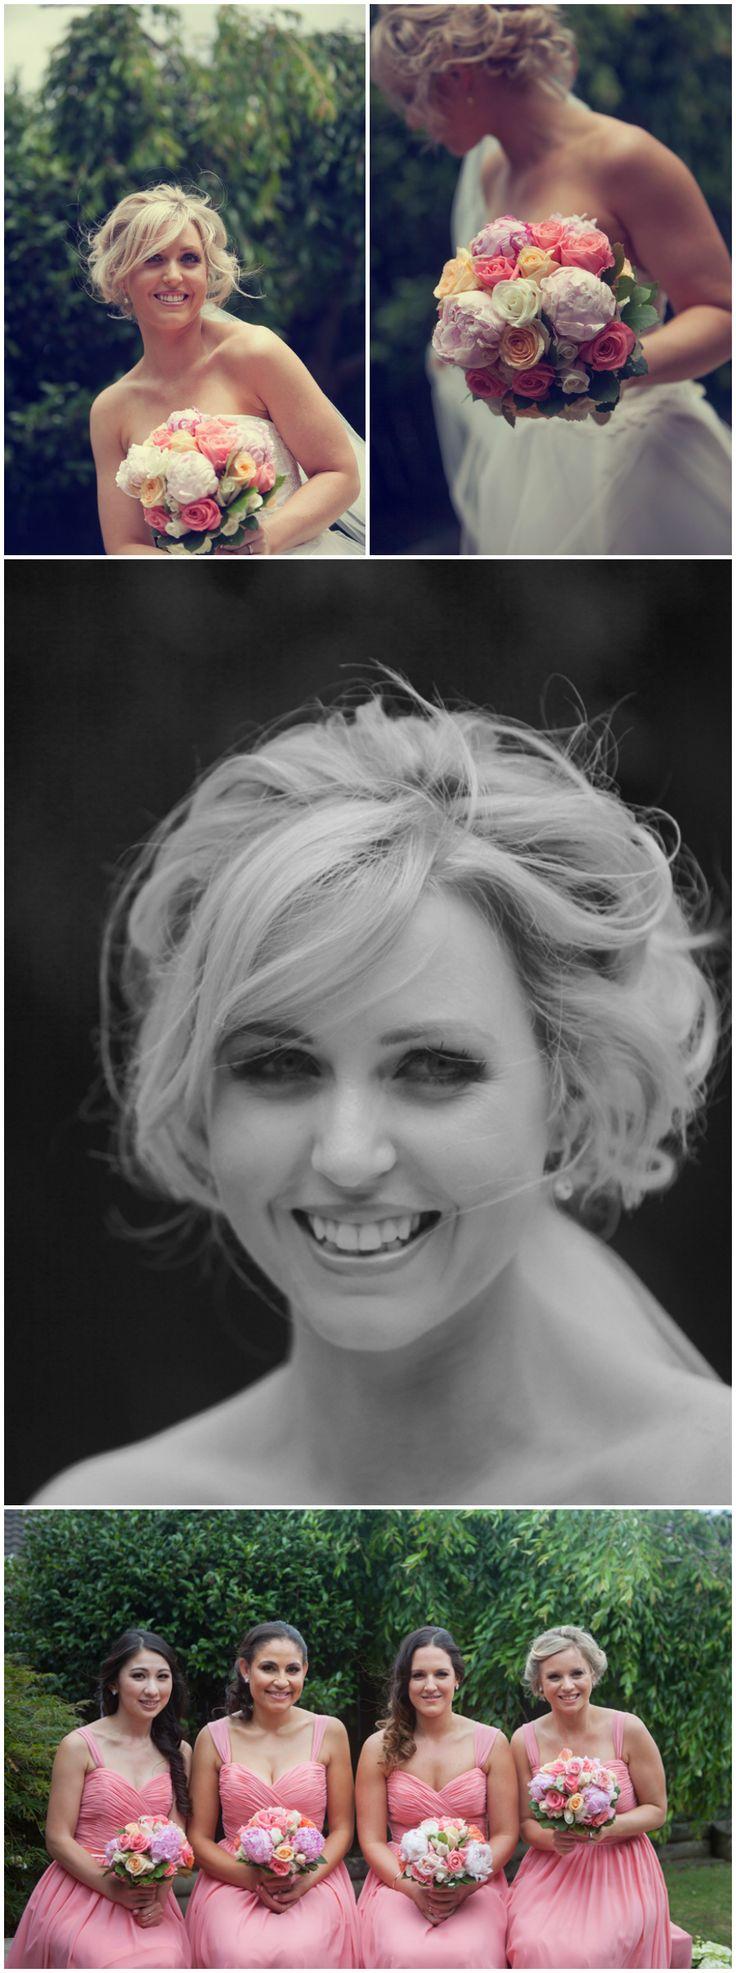 Auckland Wedding Photographer Jessica Photography Award Winning | Rachael getting ready | wedding photography auckland | http://jessicaphotography.co.nz